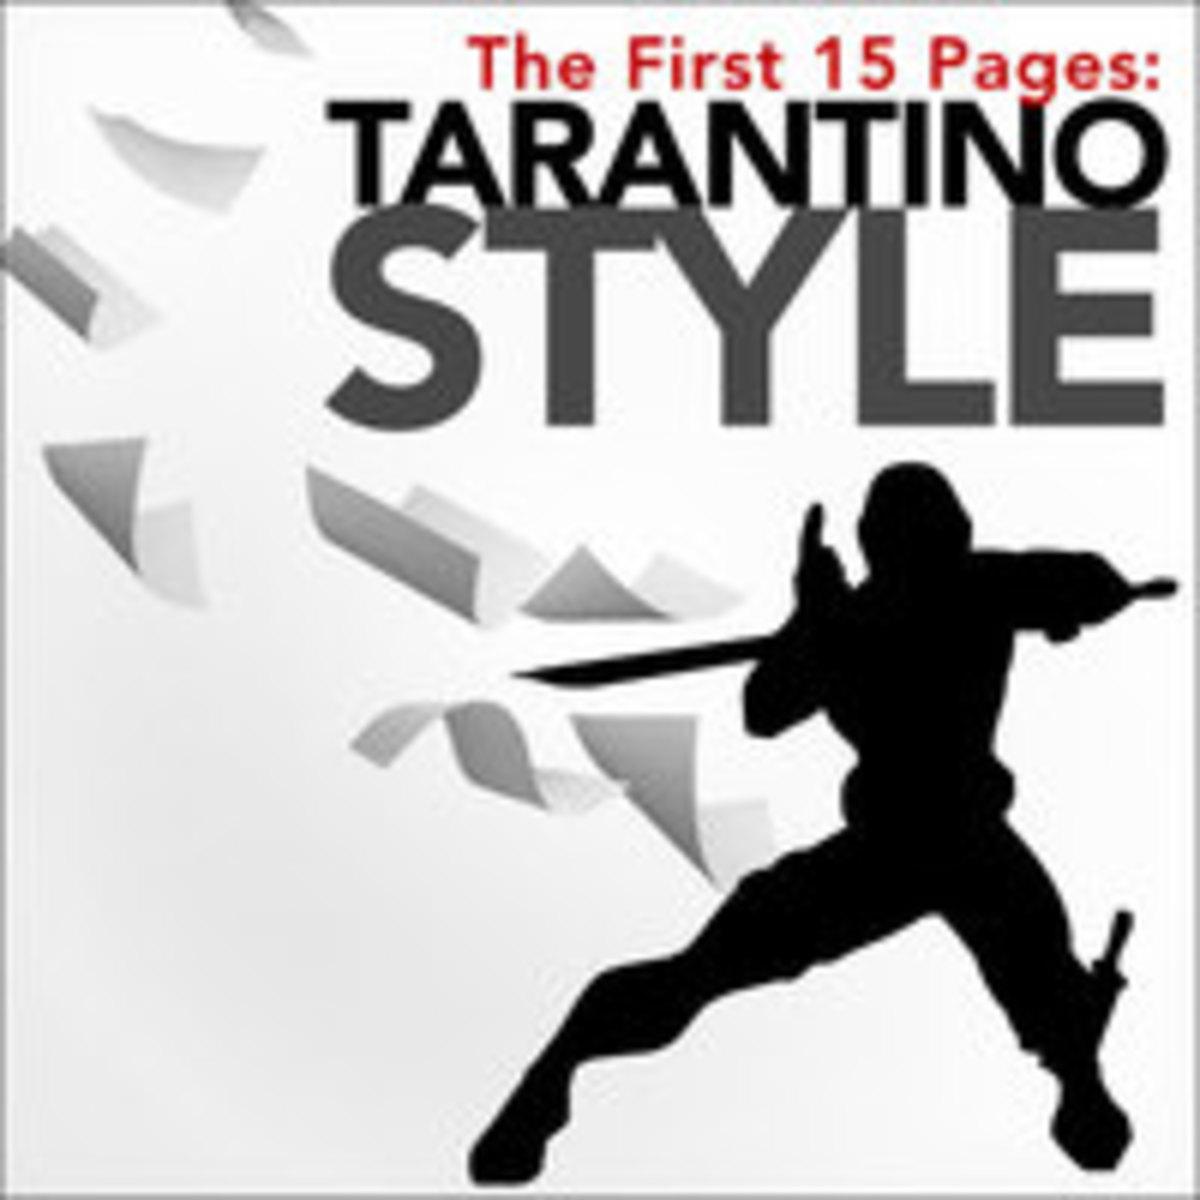 ws_first15tarantino-500_small